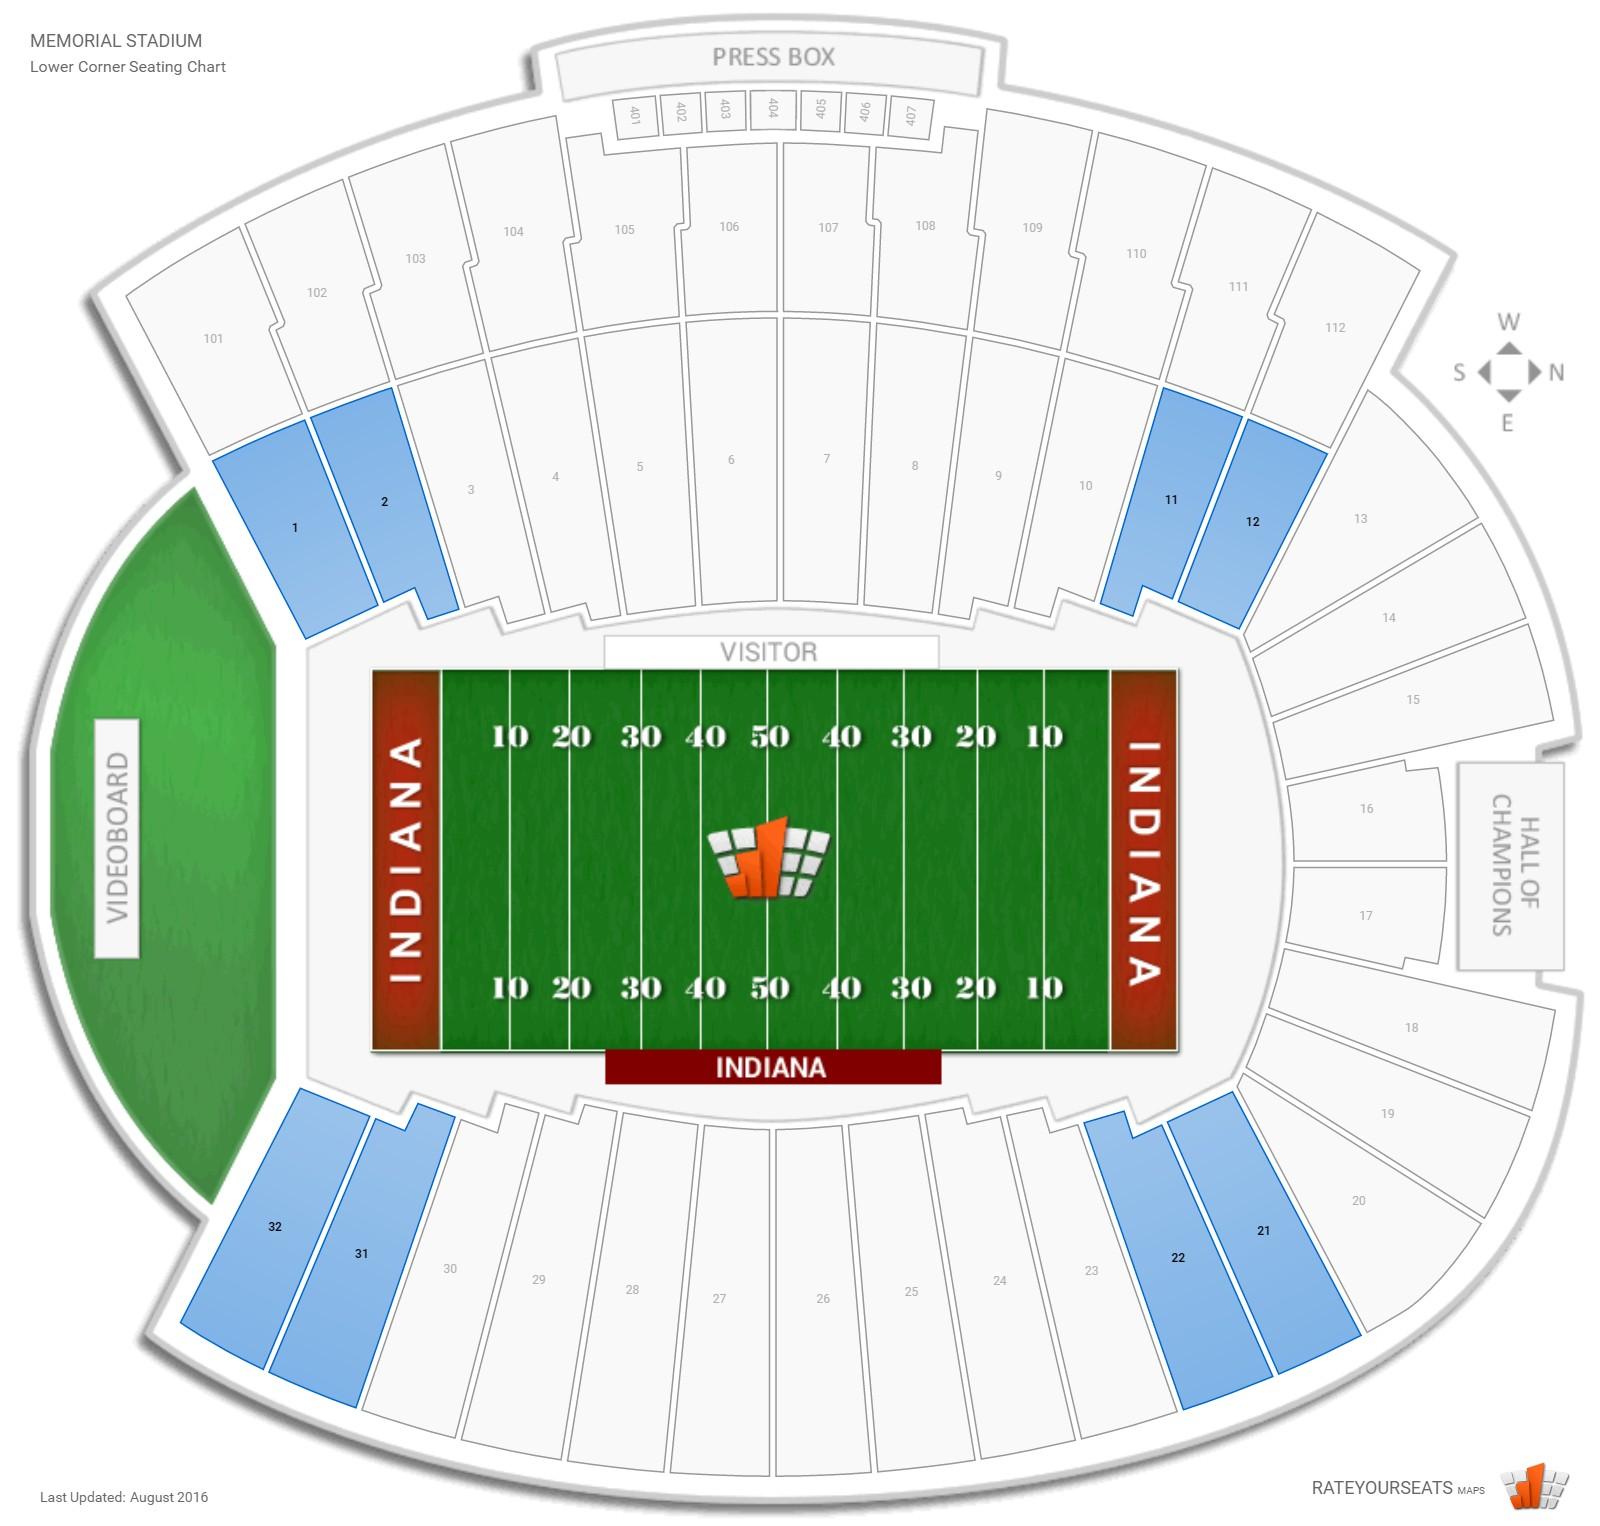 Lower Corner - Memorial Stadium Football Seating